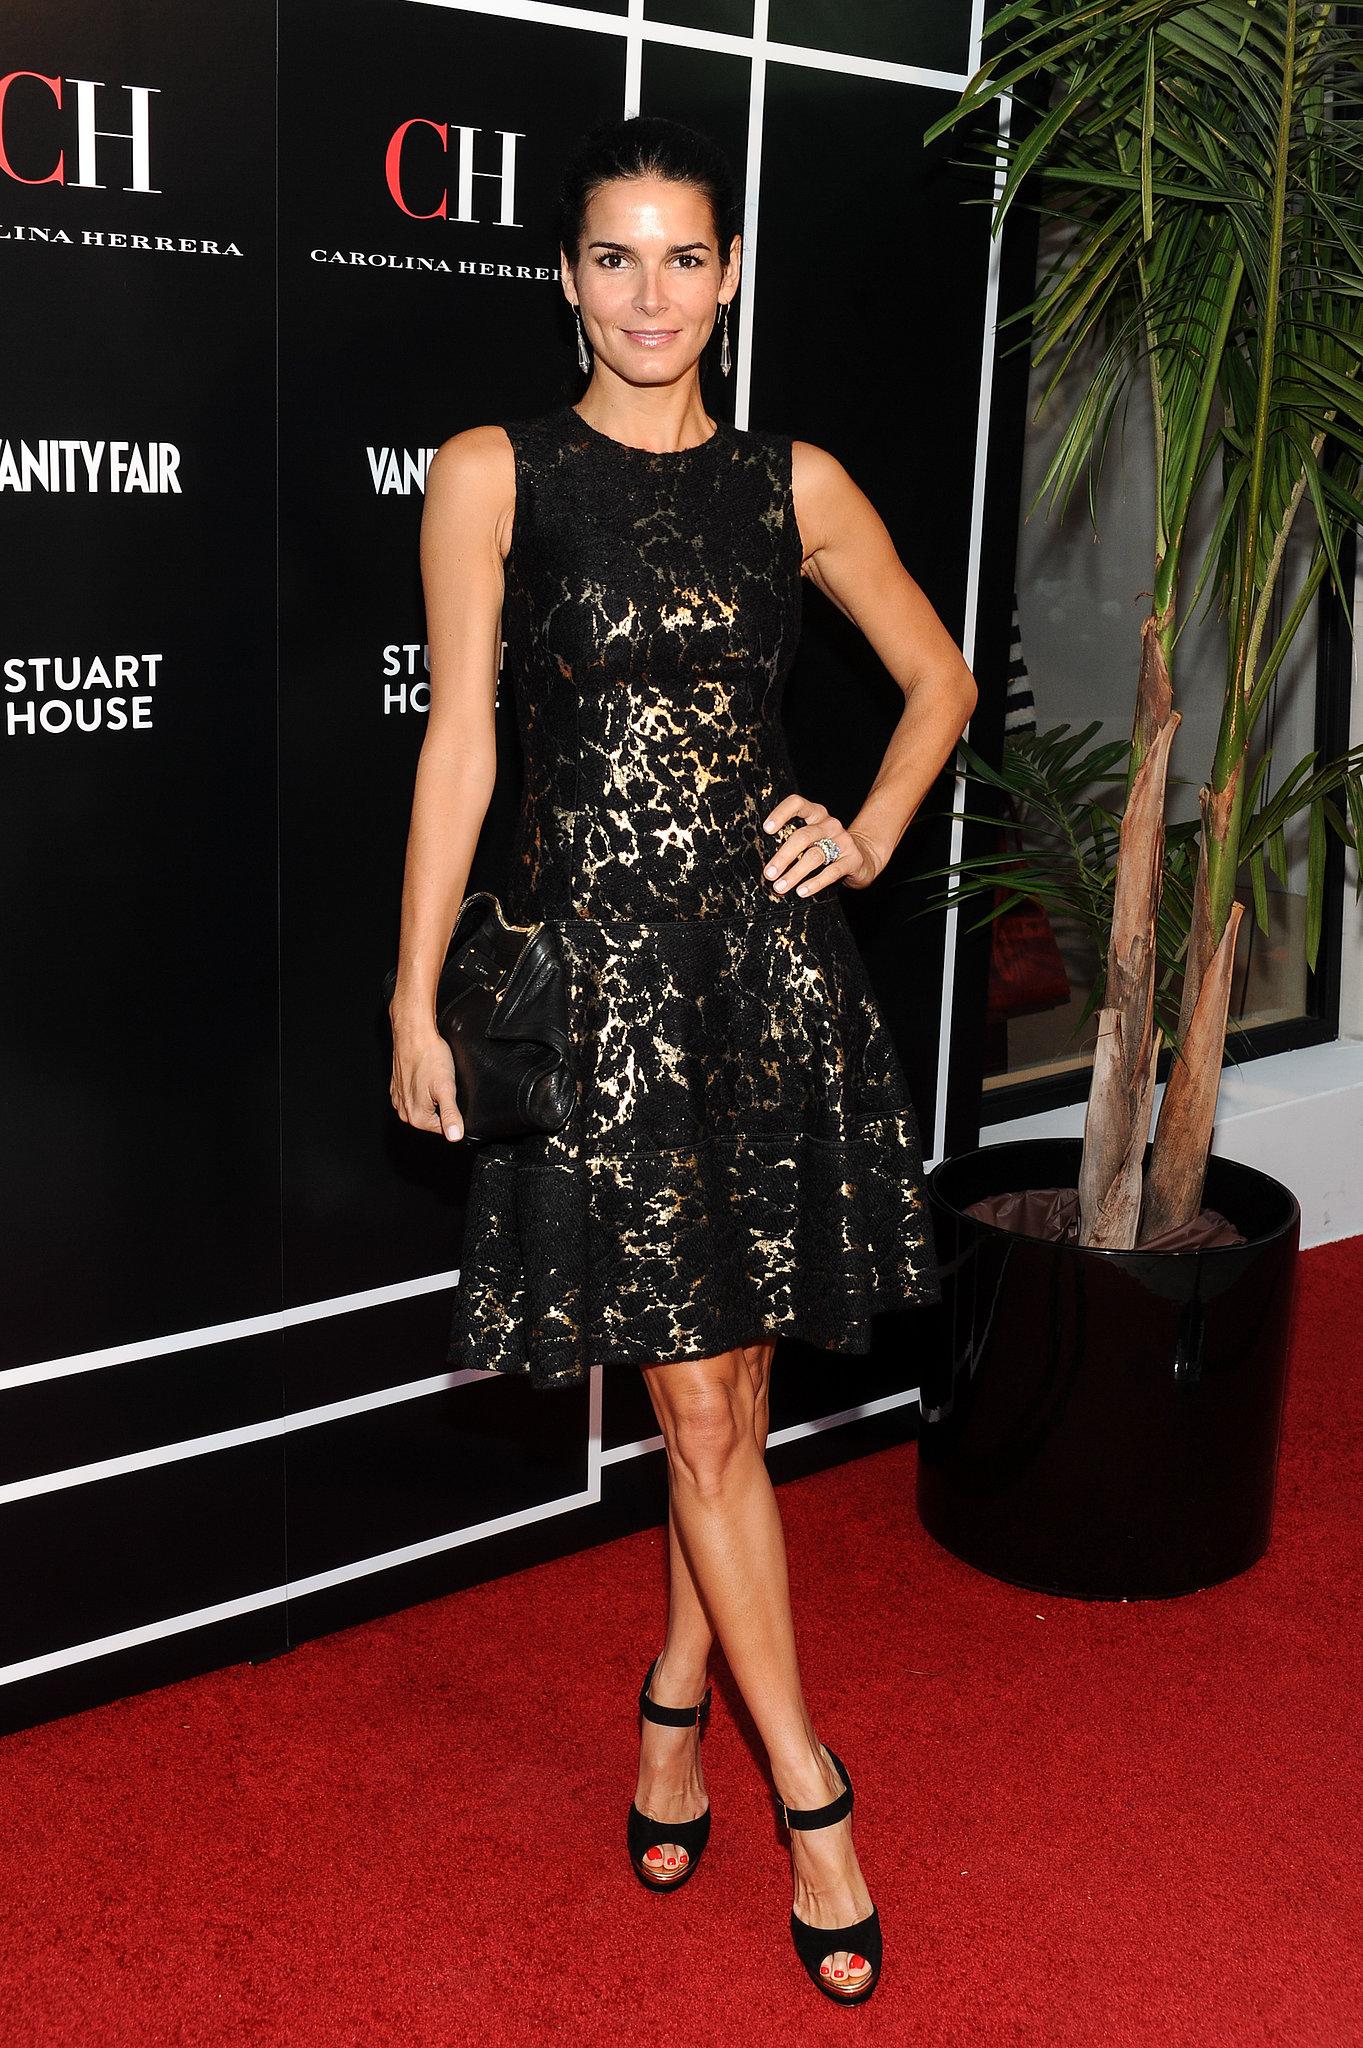 Angie-Harmon-wore-black-lace-dress-LA